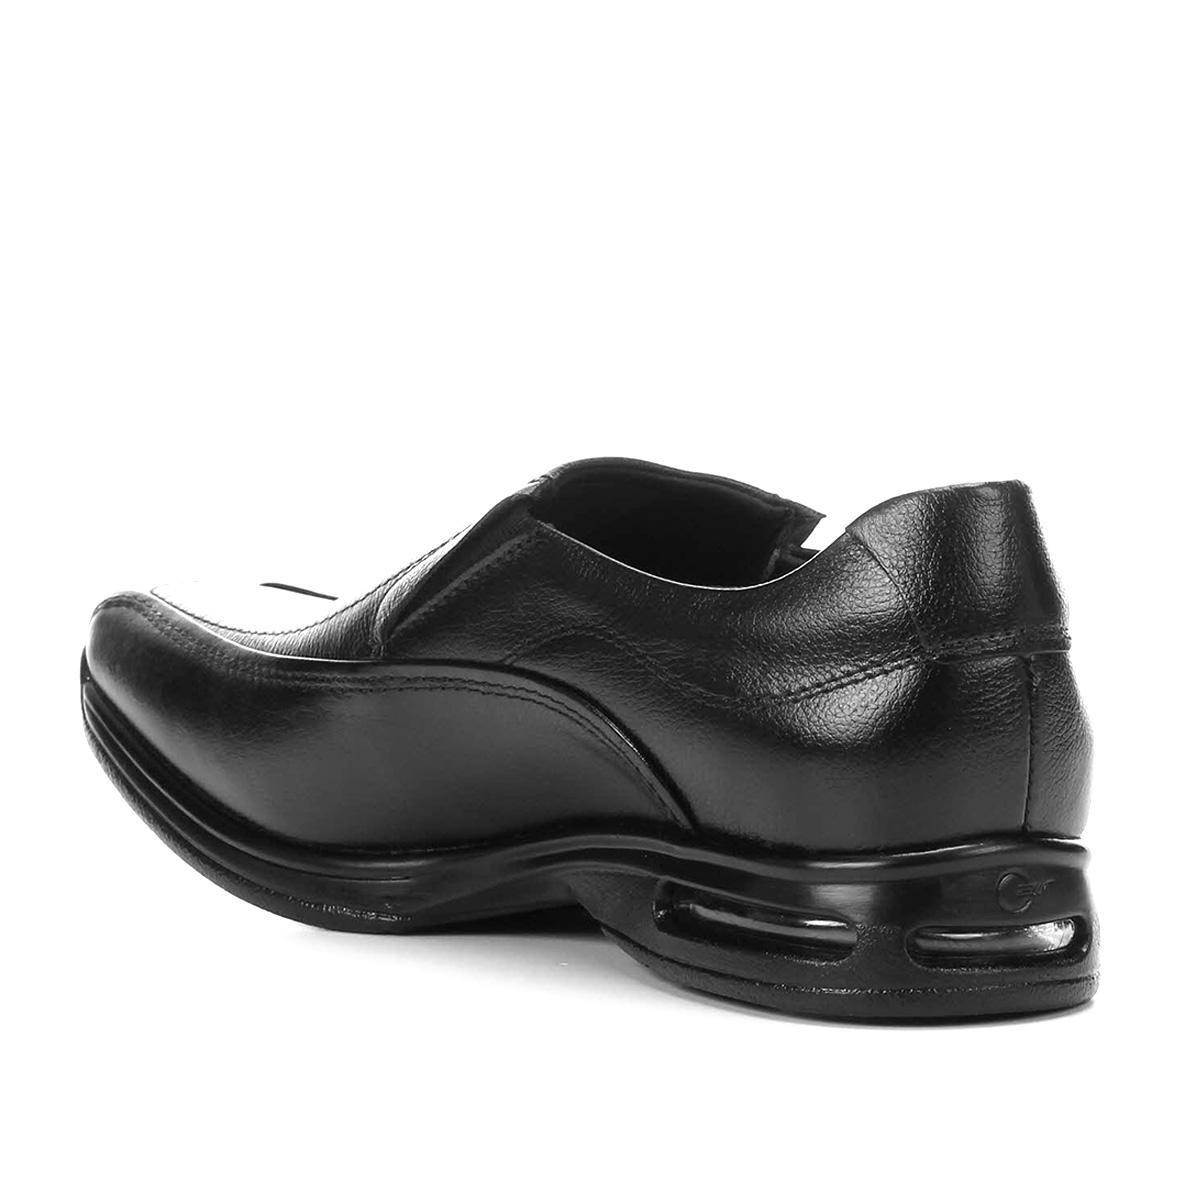 75fc2b2769 sapato social democrata smart comfort air spot masculino. Carregando zoom.